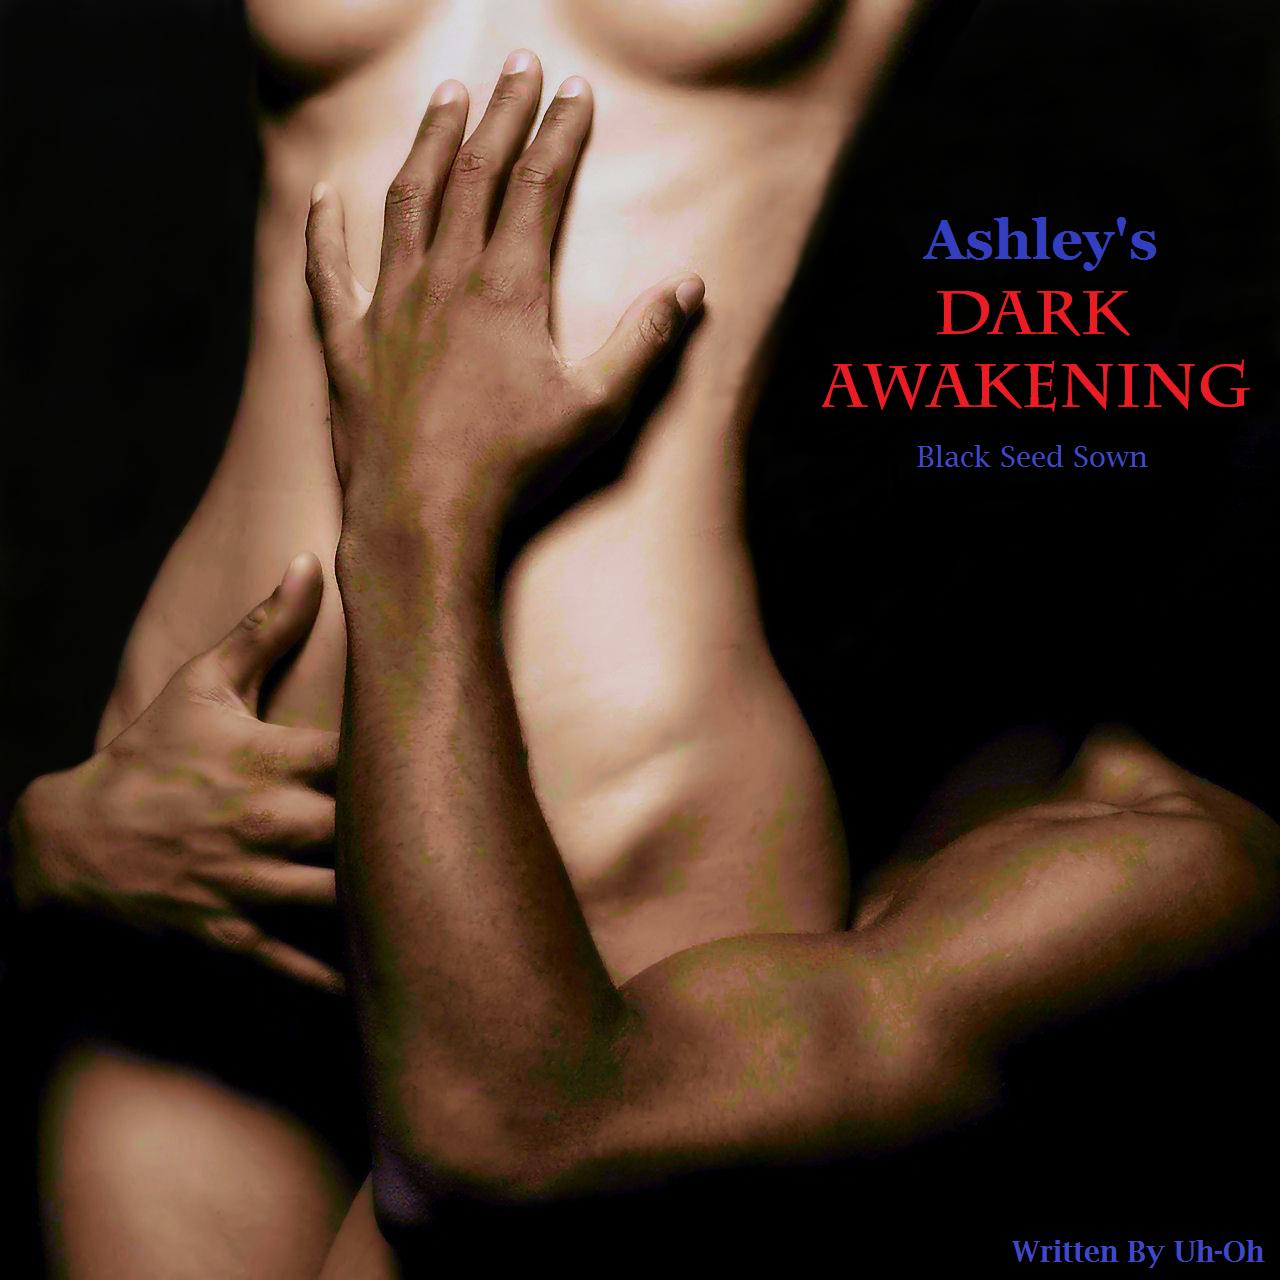 Story | Ashley's Dark Awakening: Black Seed Sown